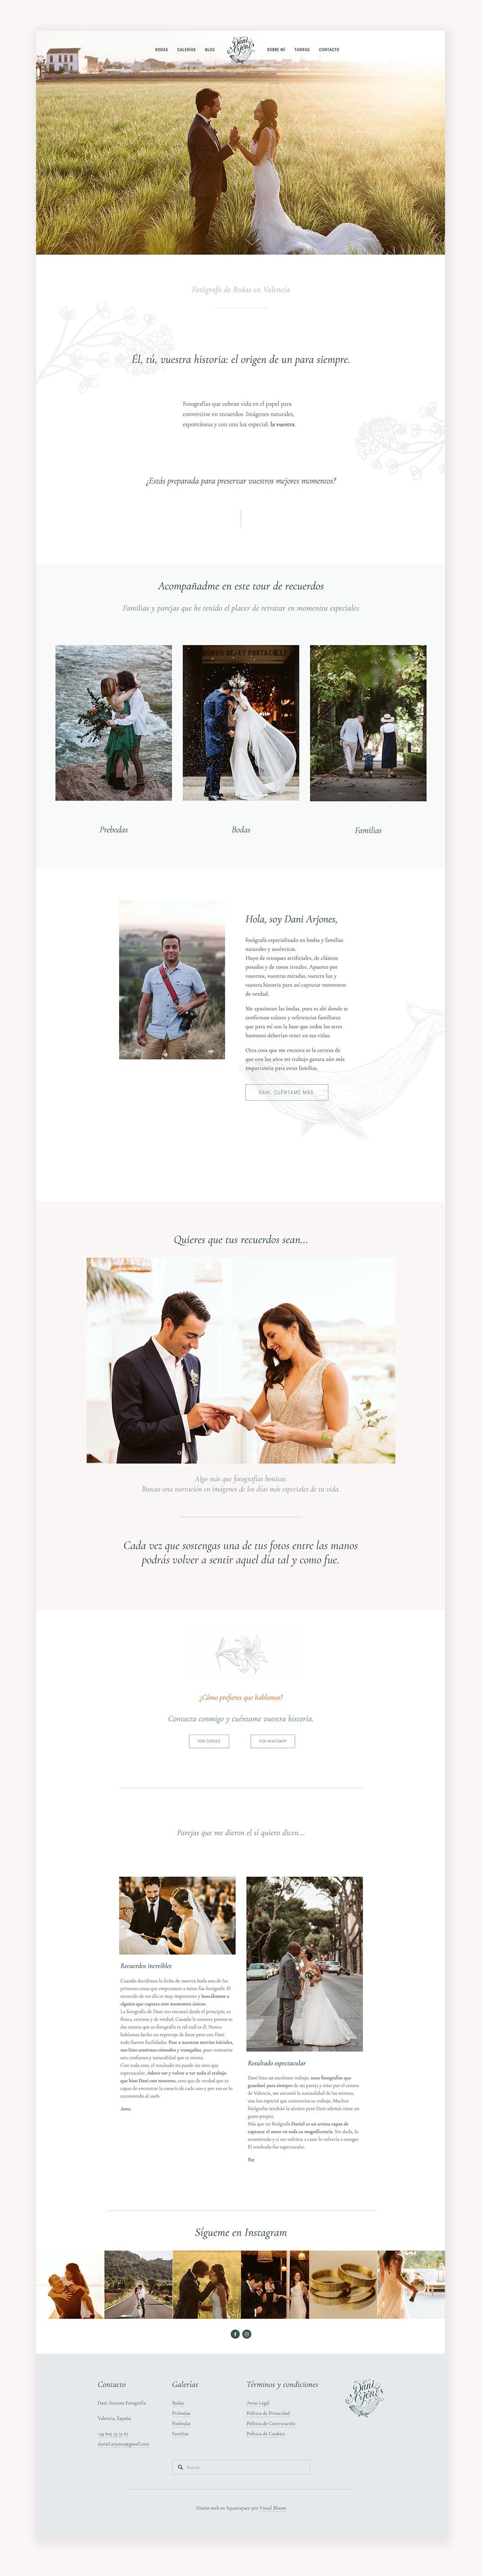 diseño web Squarespace Inicio.jpg